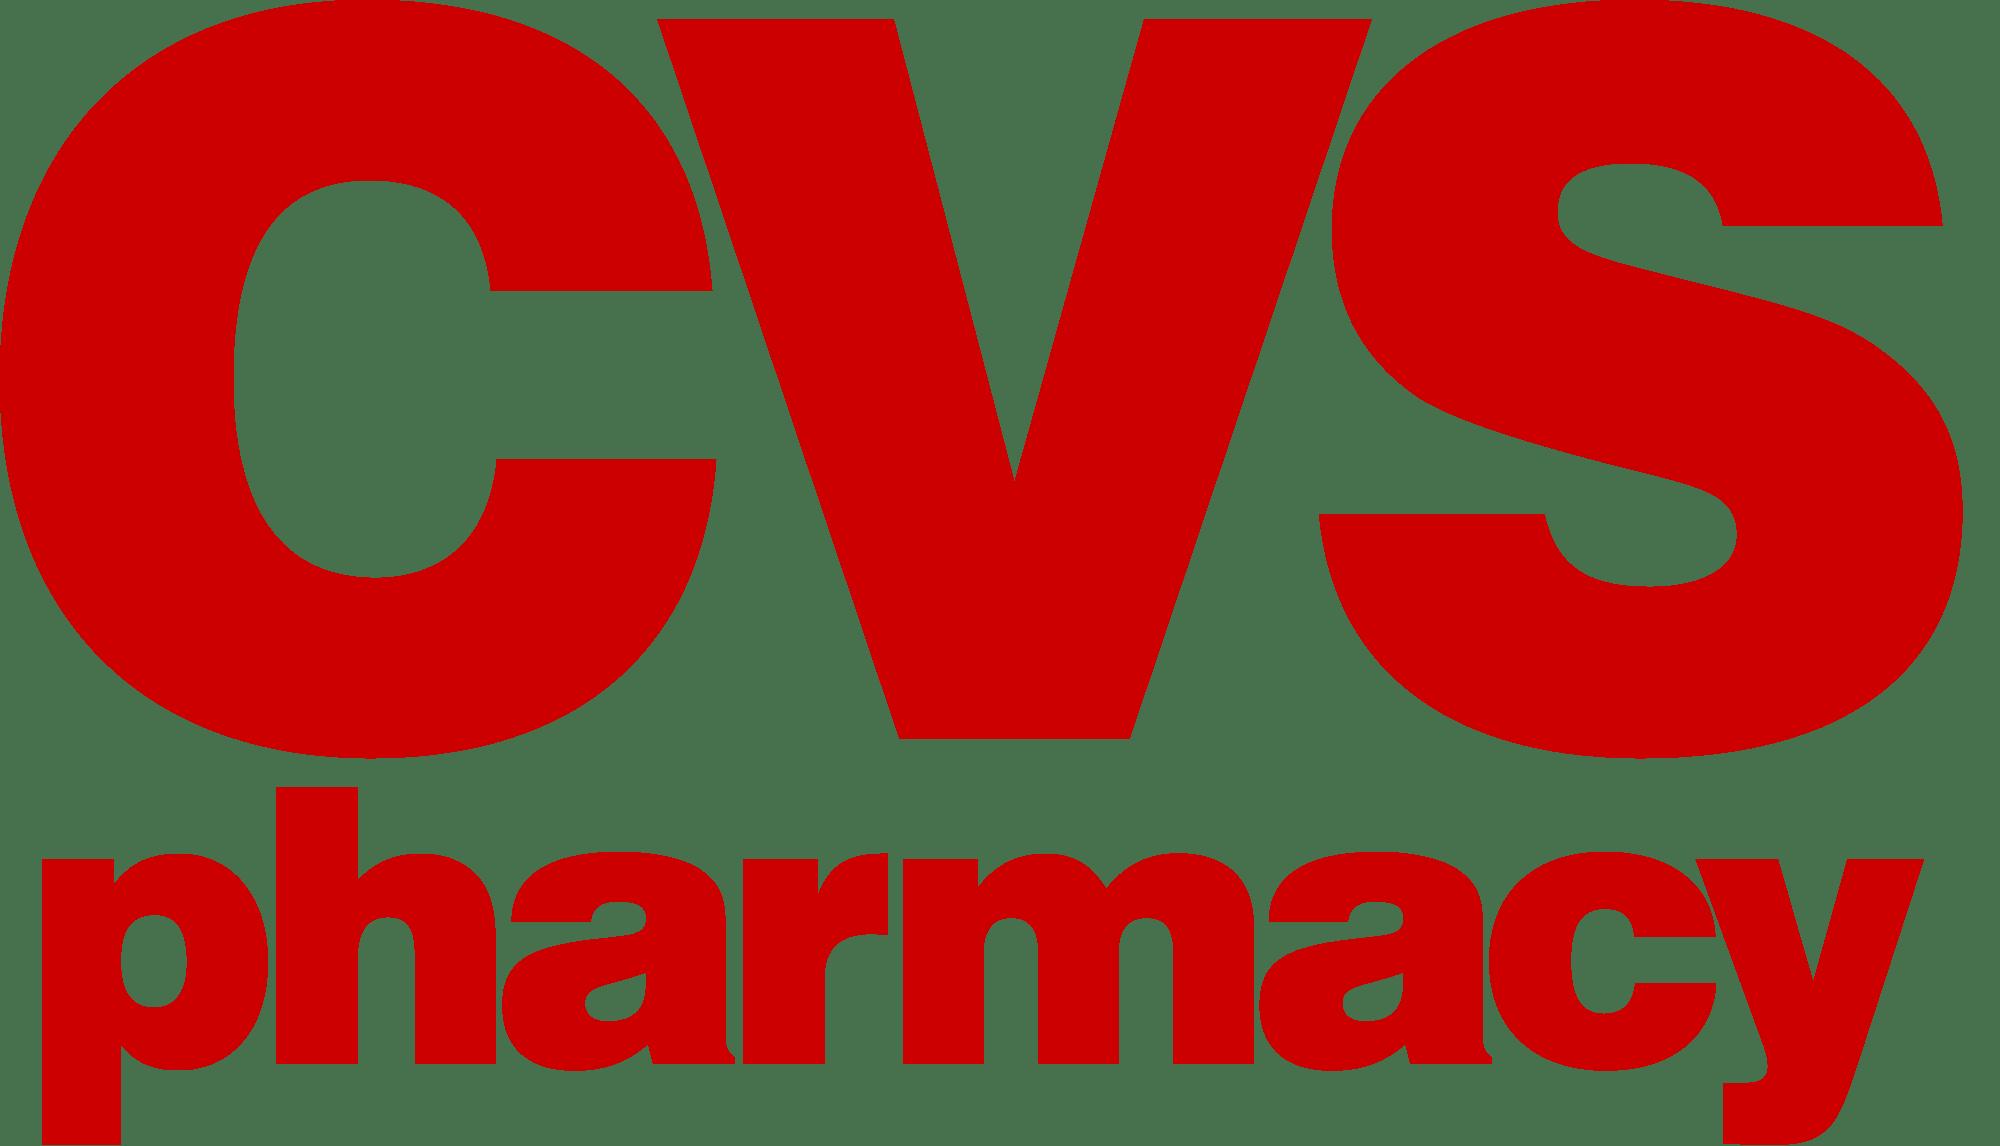 CVS Deal汇总 (01/08/17-01/14/17)